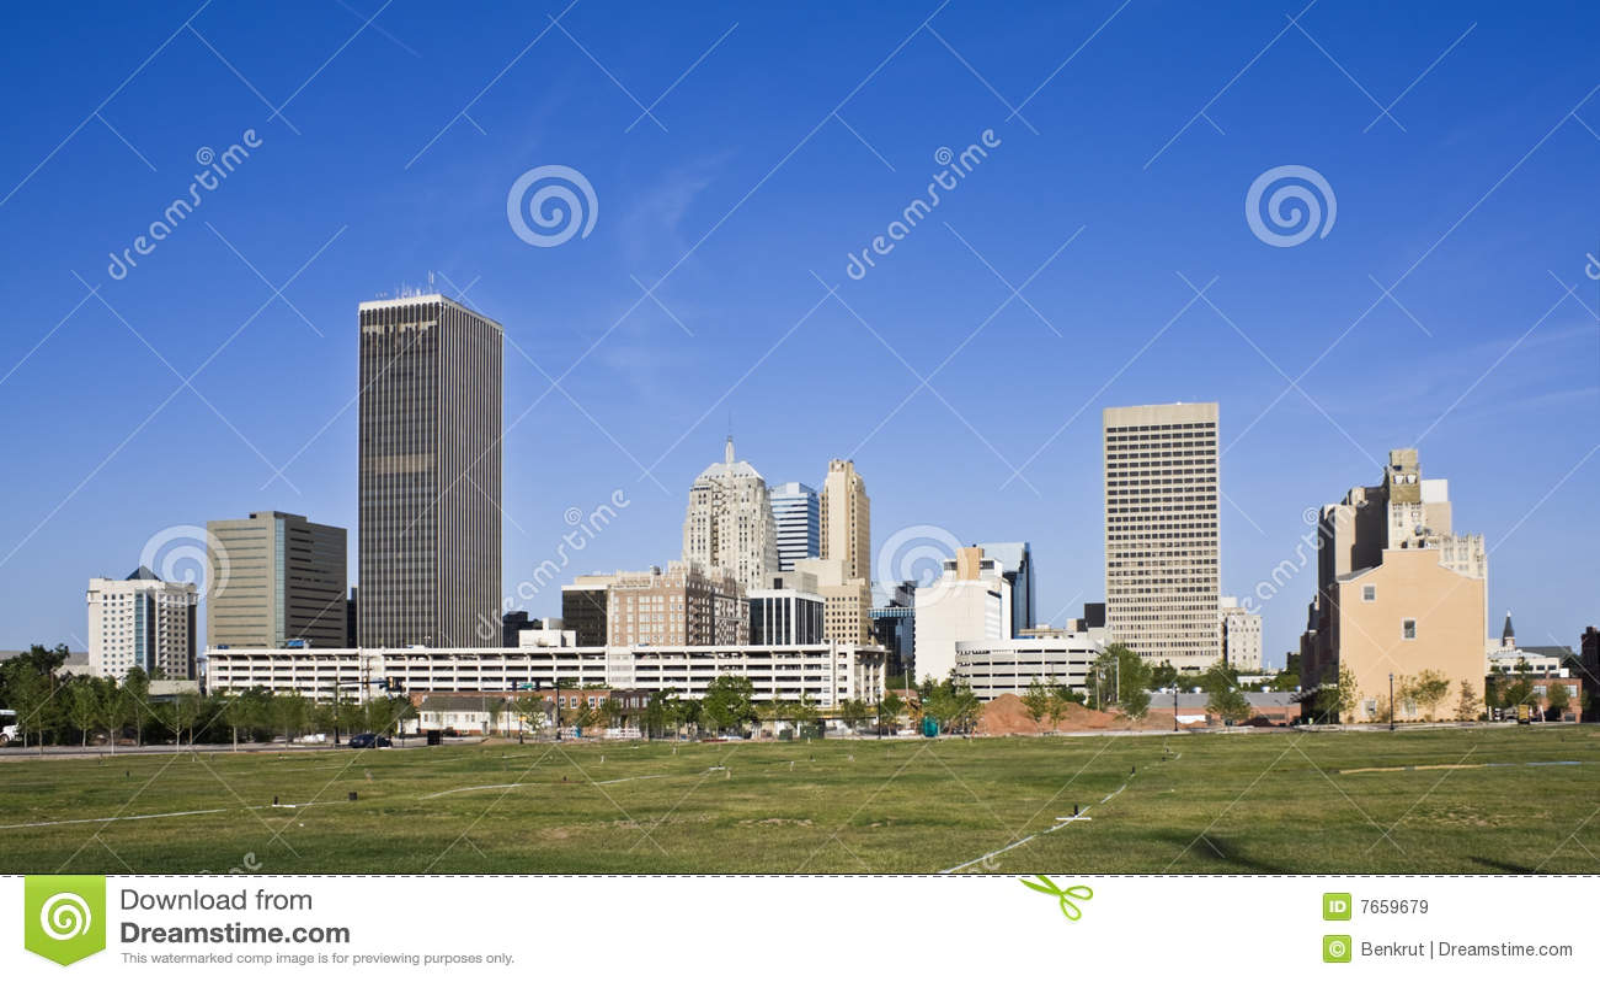 Free dating oklahoma city